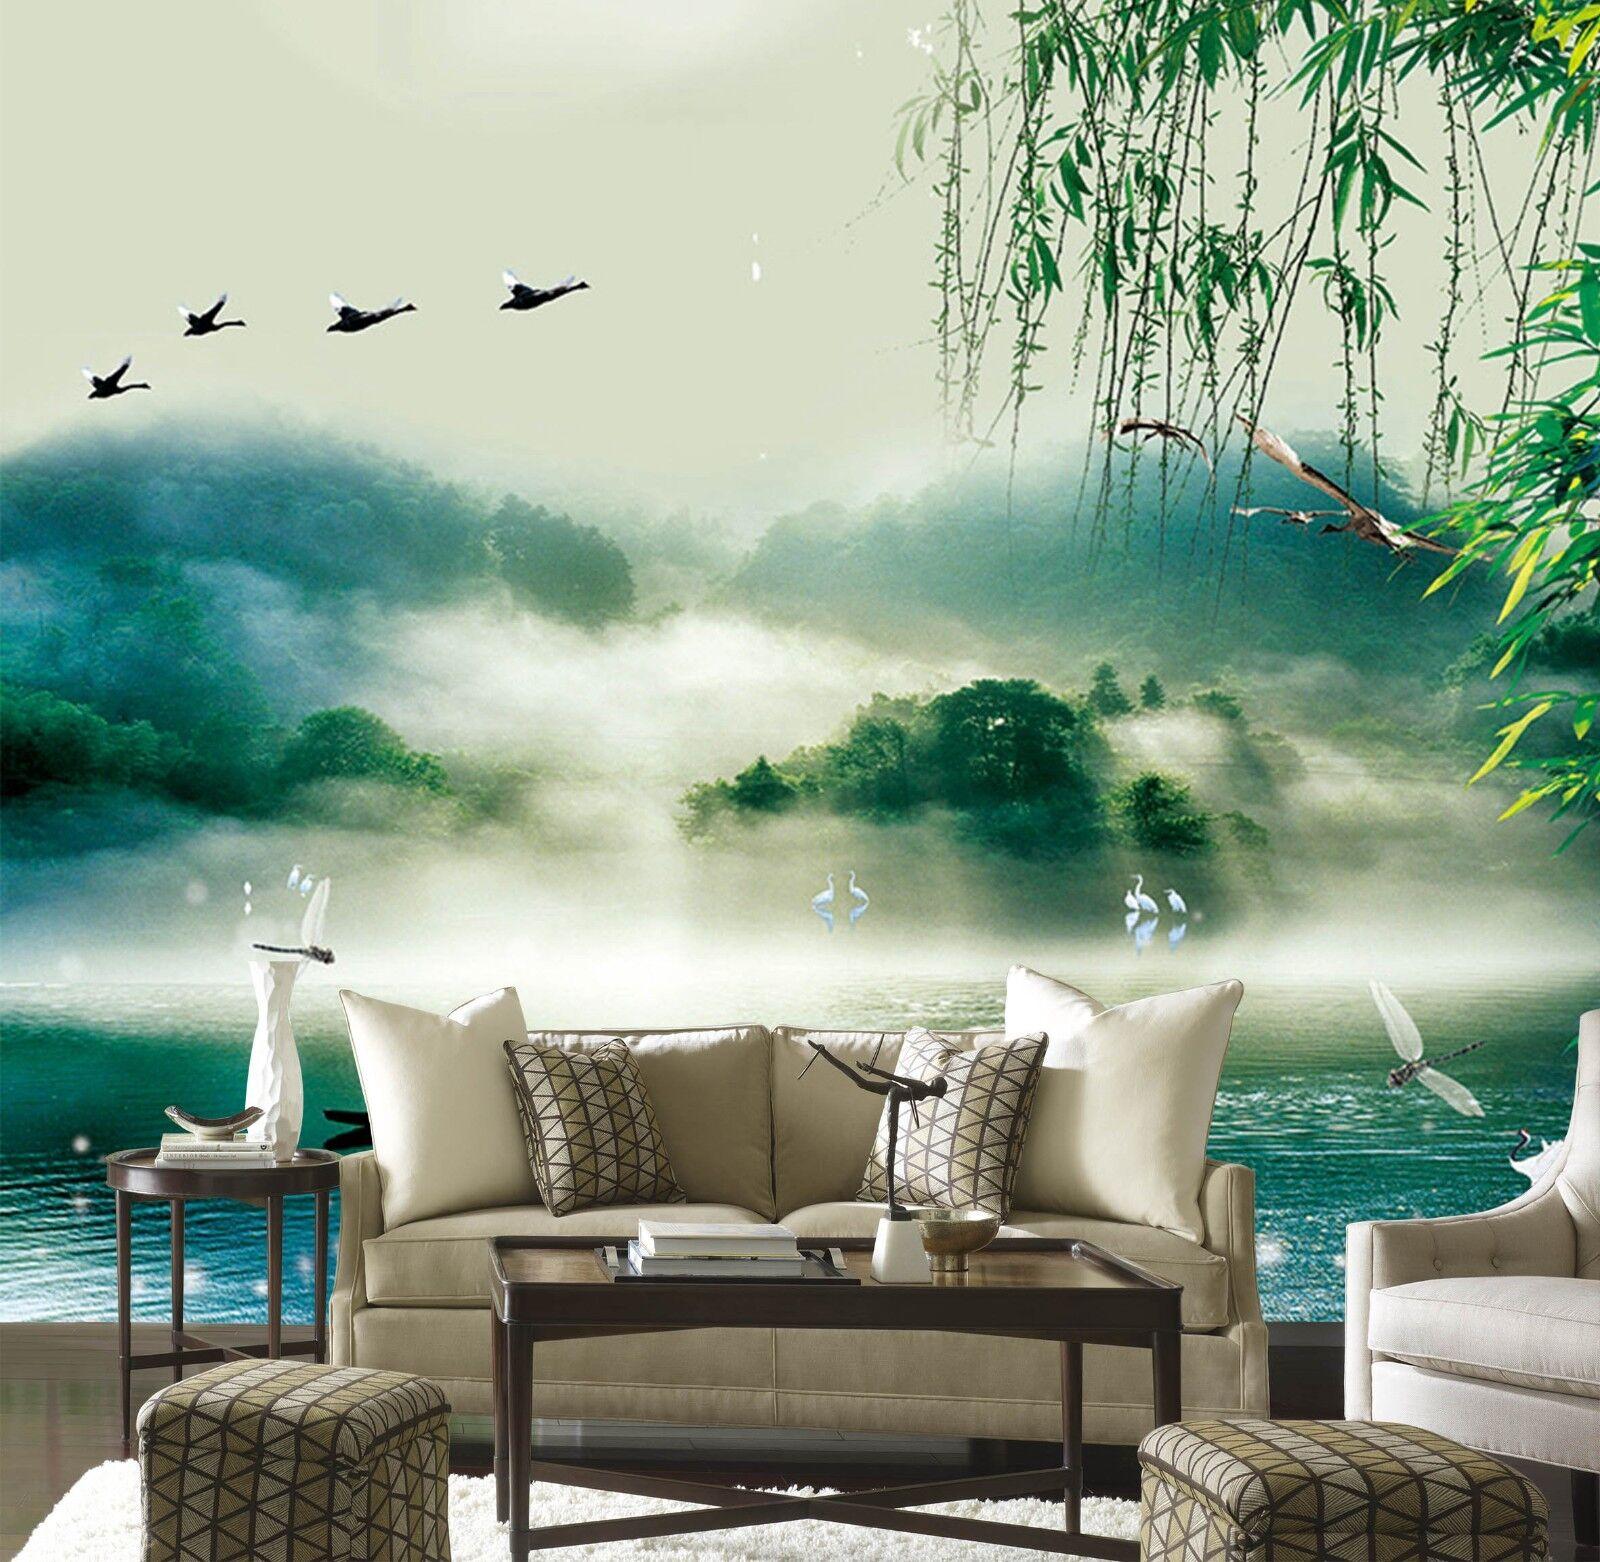 3D Landschafts Weide 888 Tapete Wandgemälde Tapeten Bild Familie DE Lemon